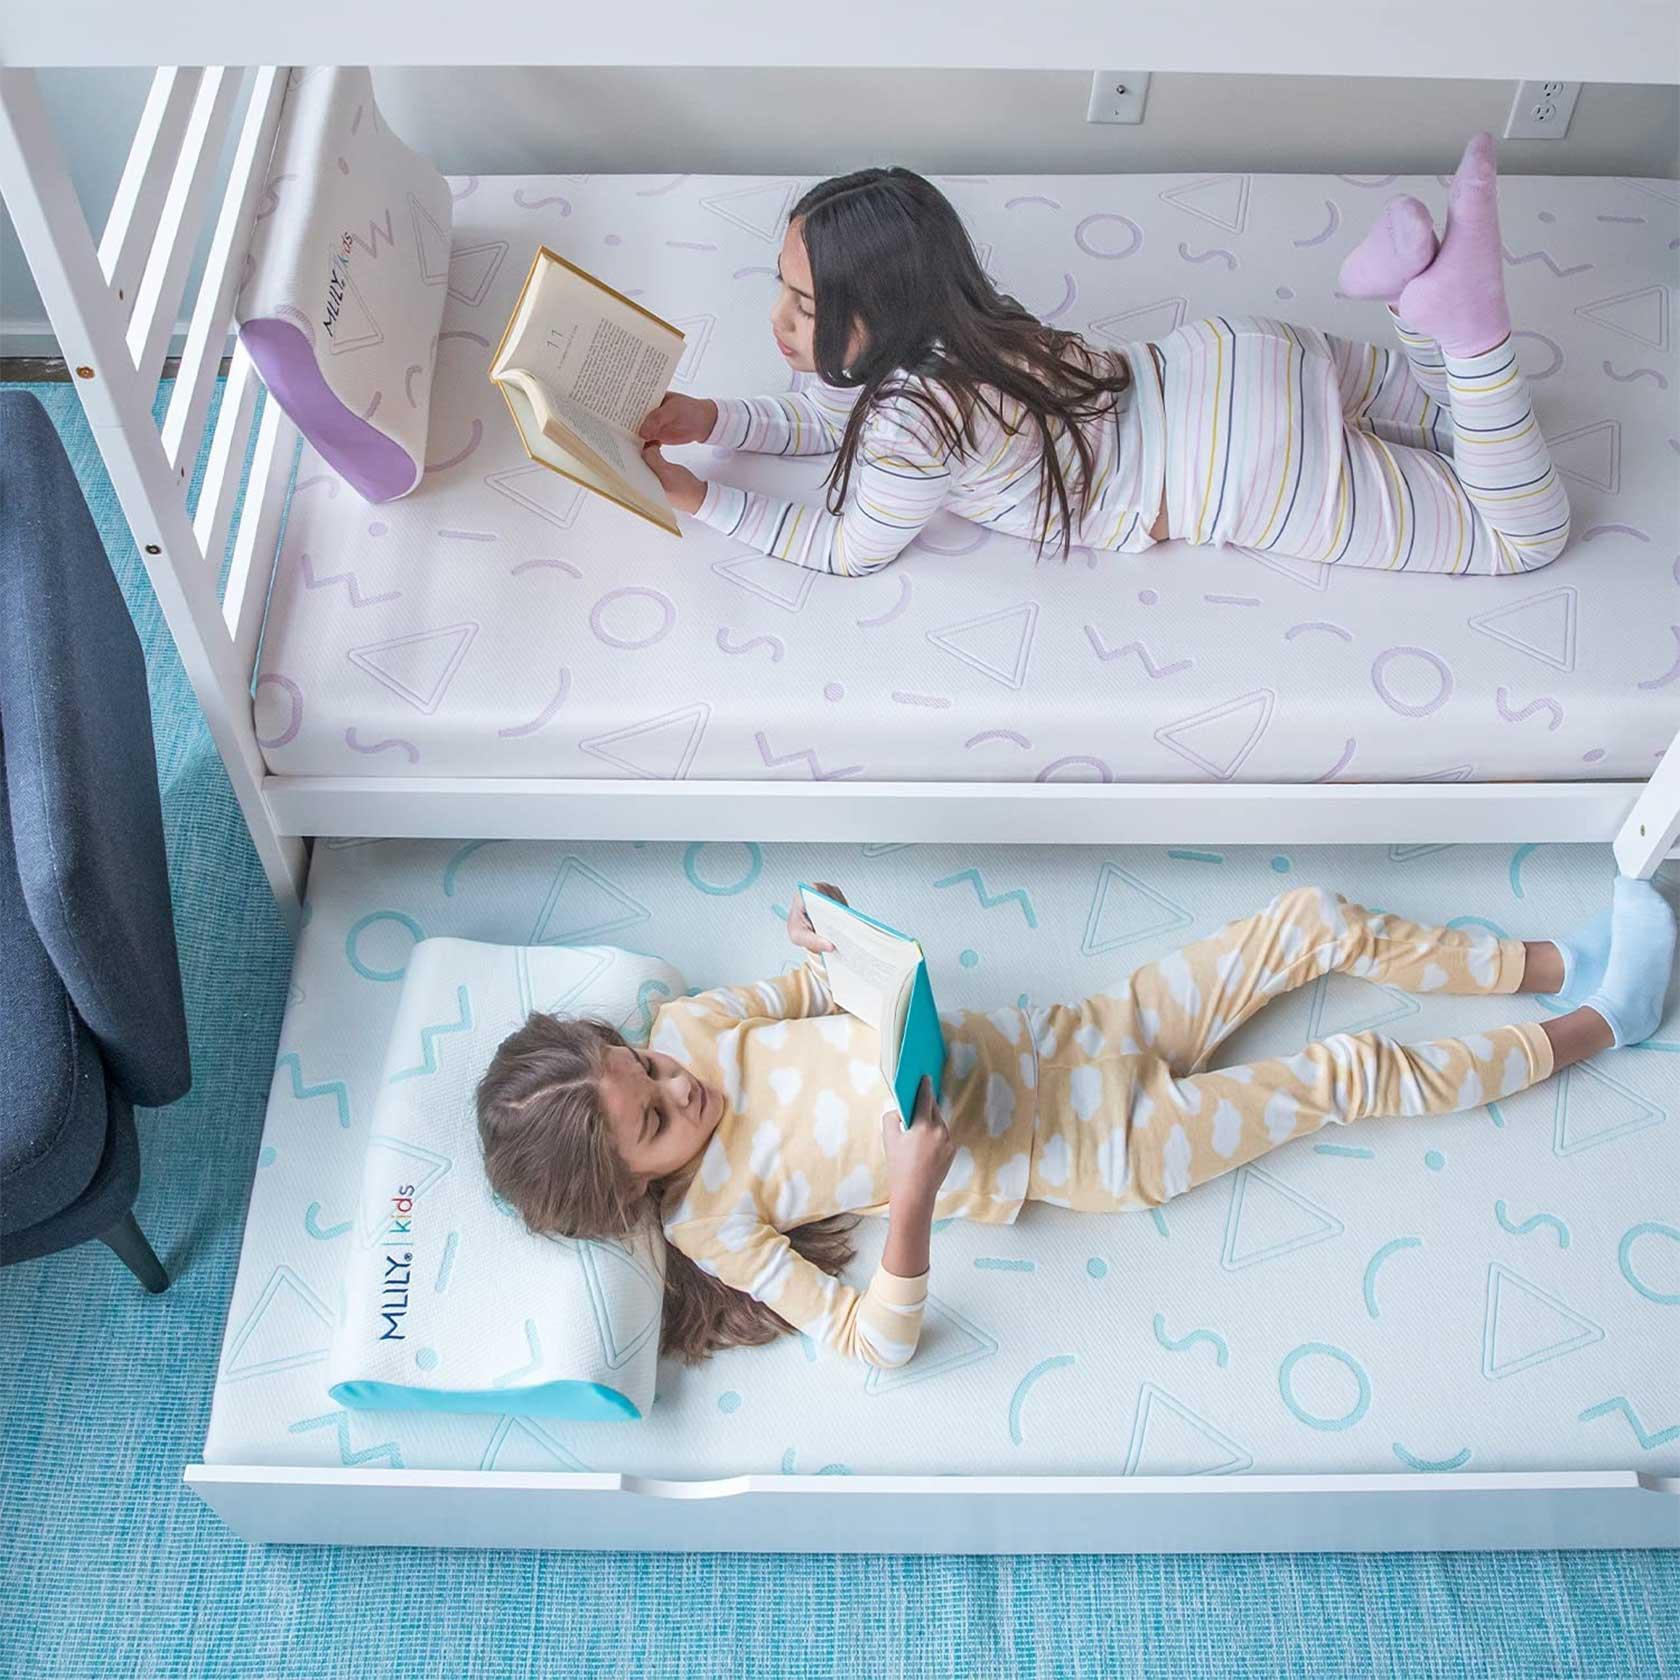 Memory Foam Mattress For Kids